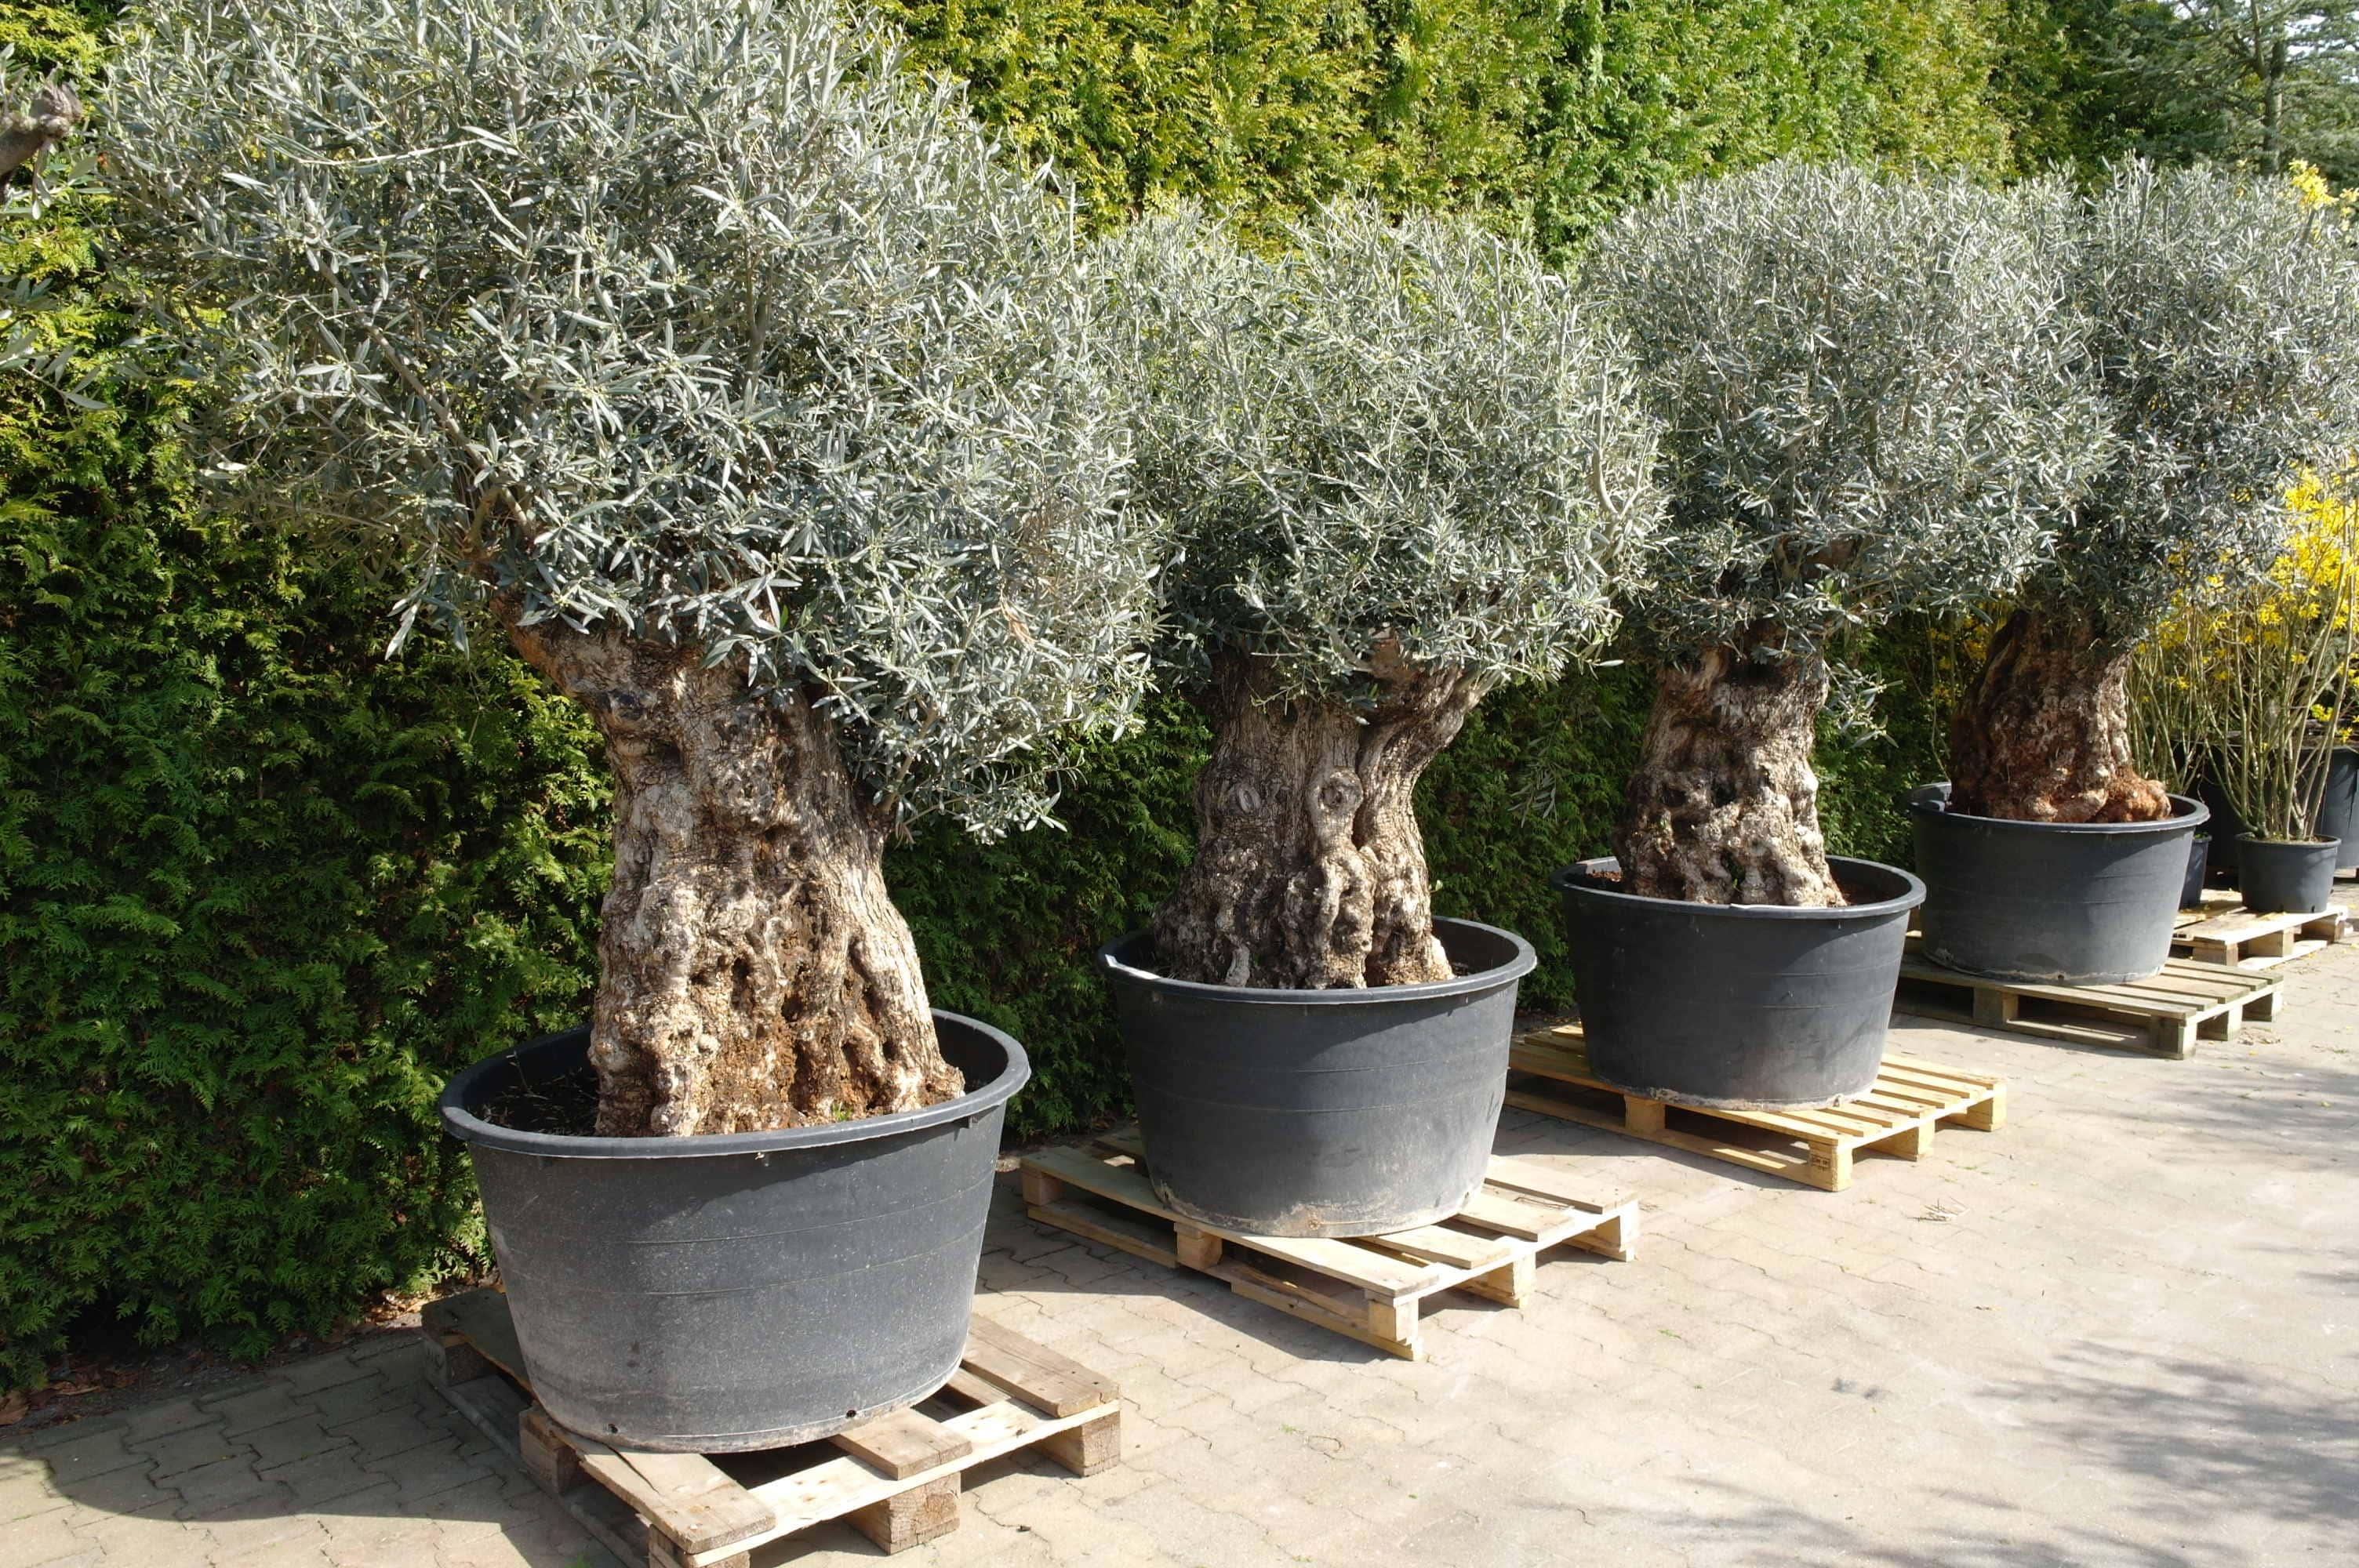 Olijfboom Olea Europea Bonsai Extra 120 140 Cm Goedkopeolijfbomen Nl